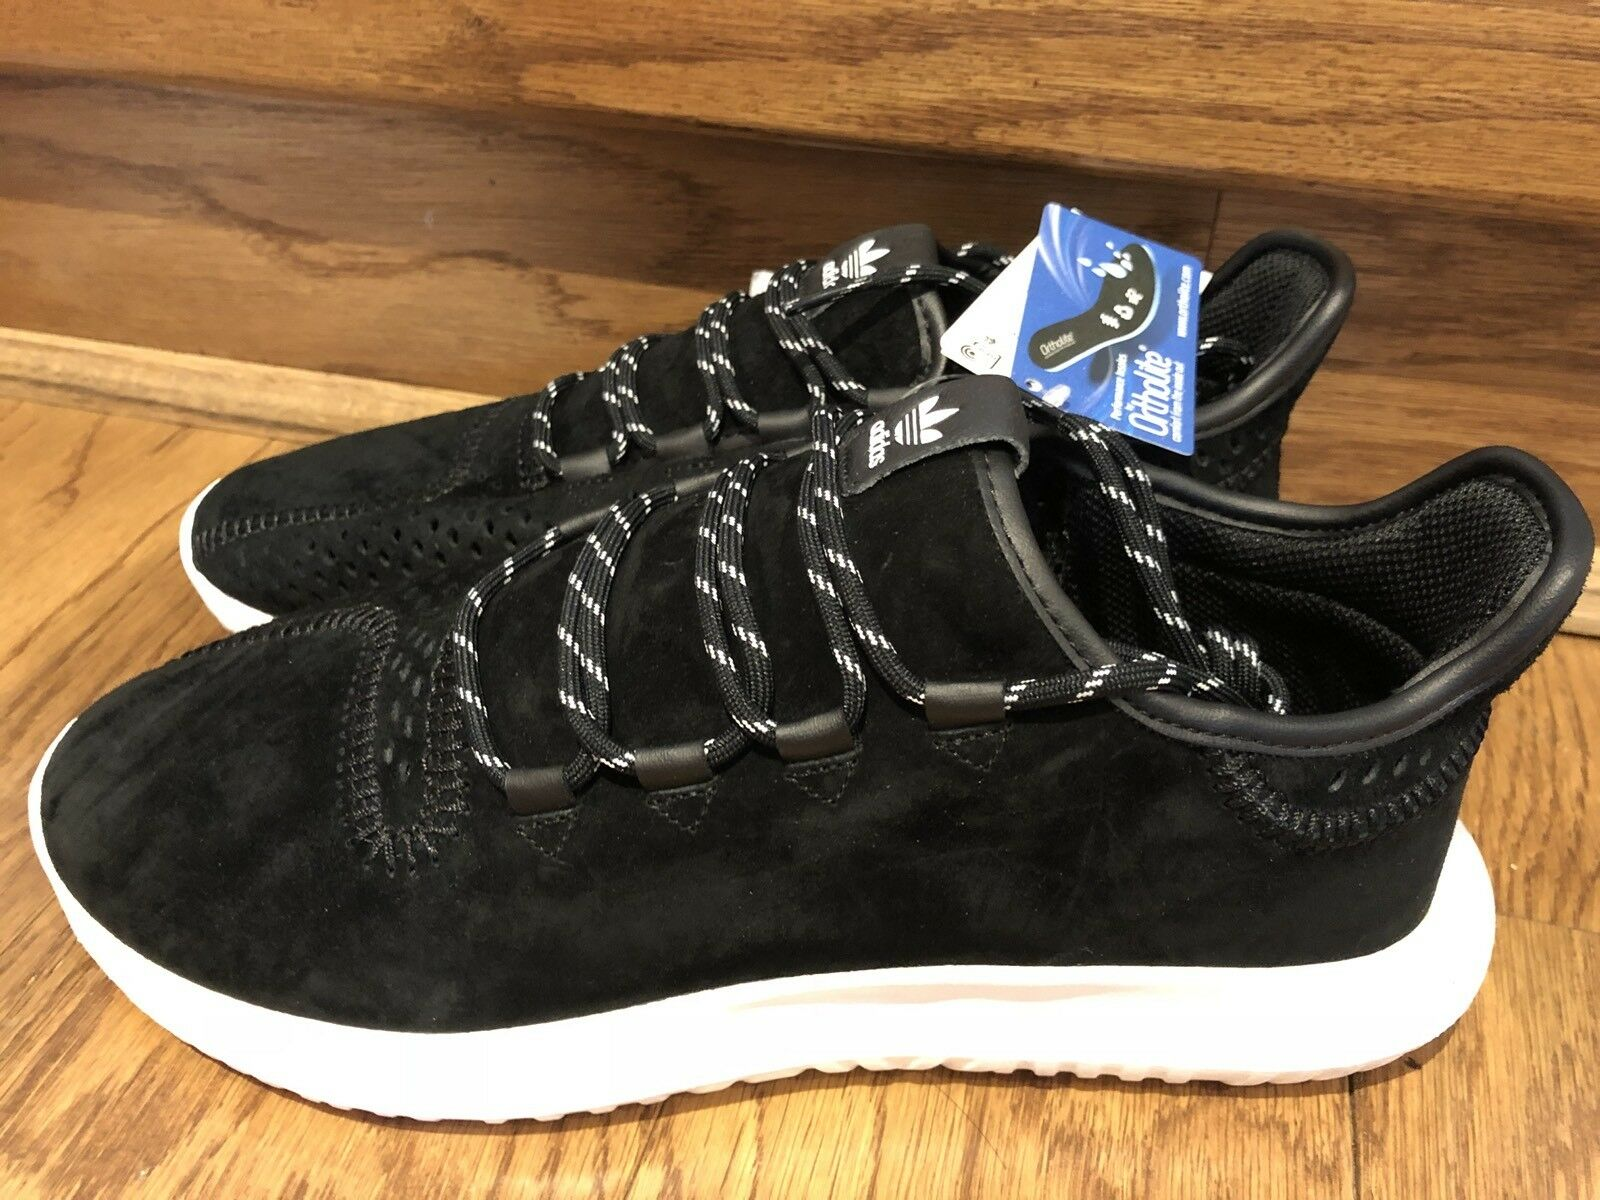 Adidas Originals Mens Size 11.5 Tubular Shadow Shoes Sneaker Men Black CQ0933